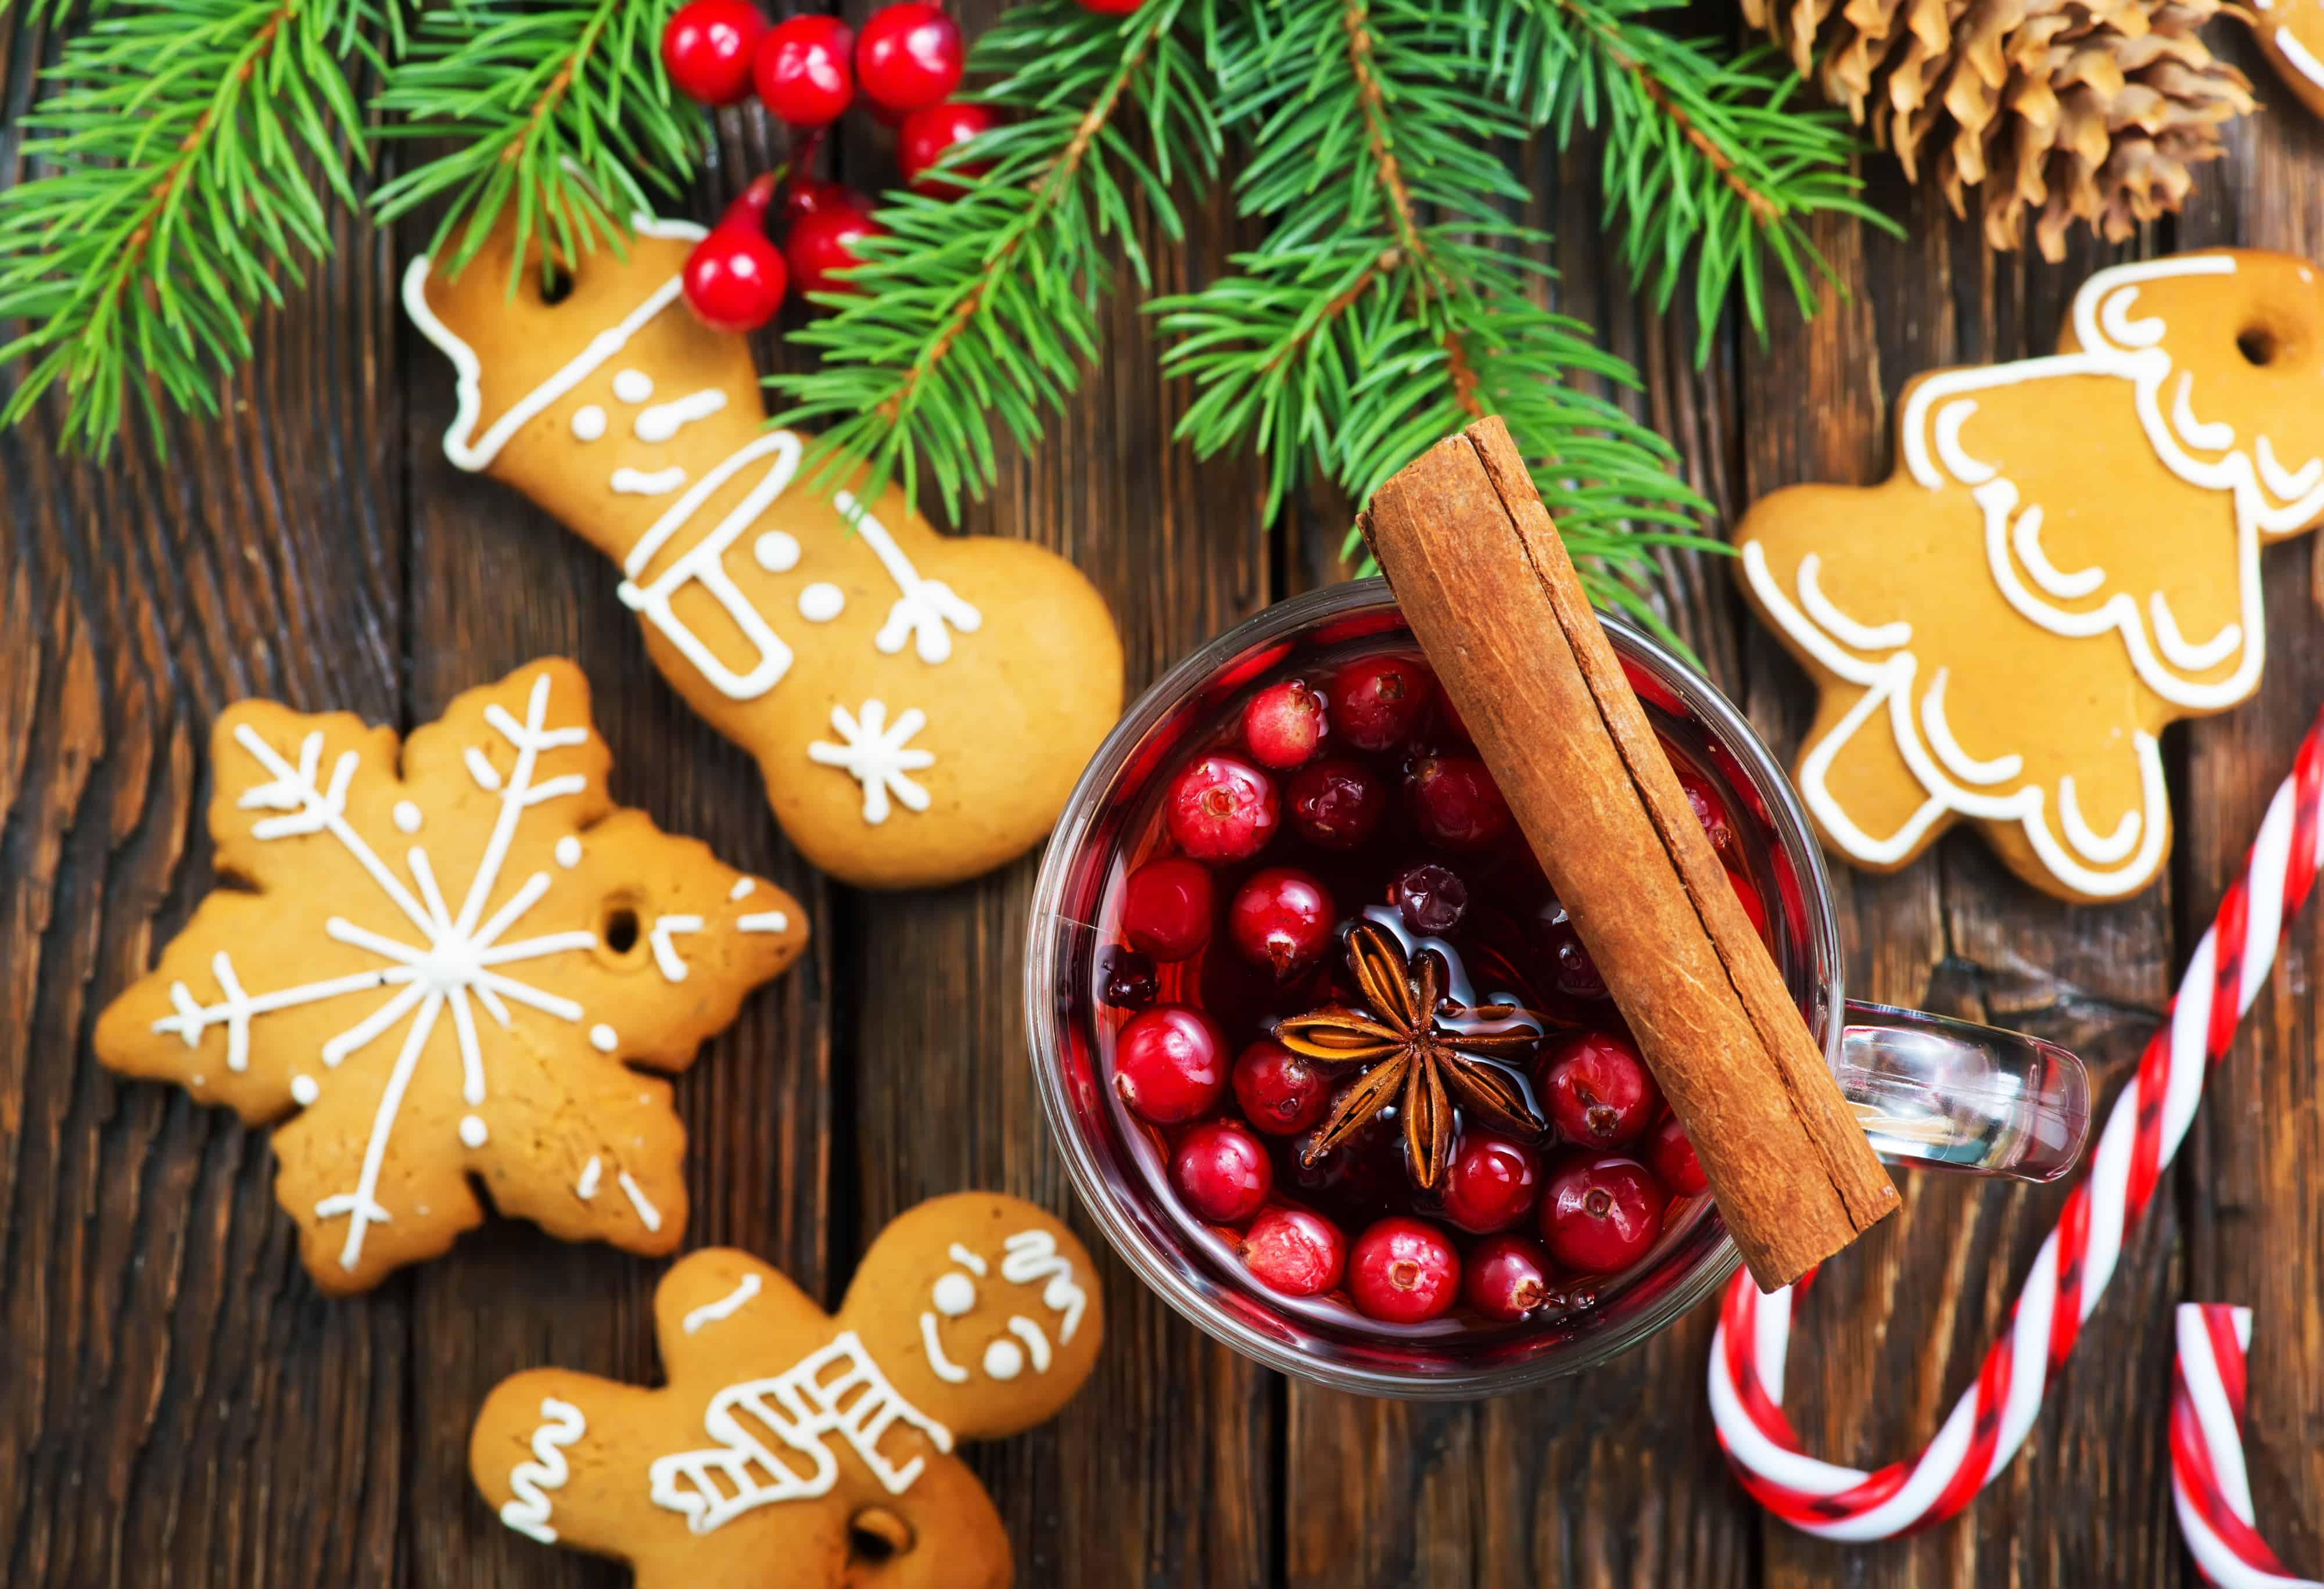 How to Enjoy a No-school December, Guilt-free